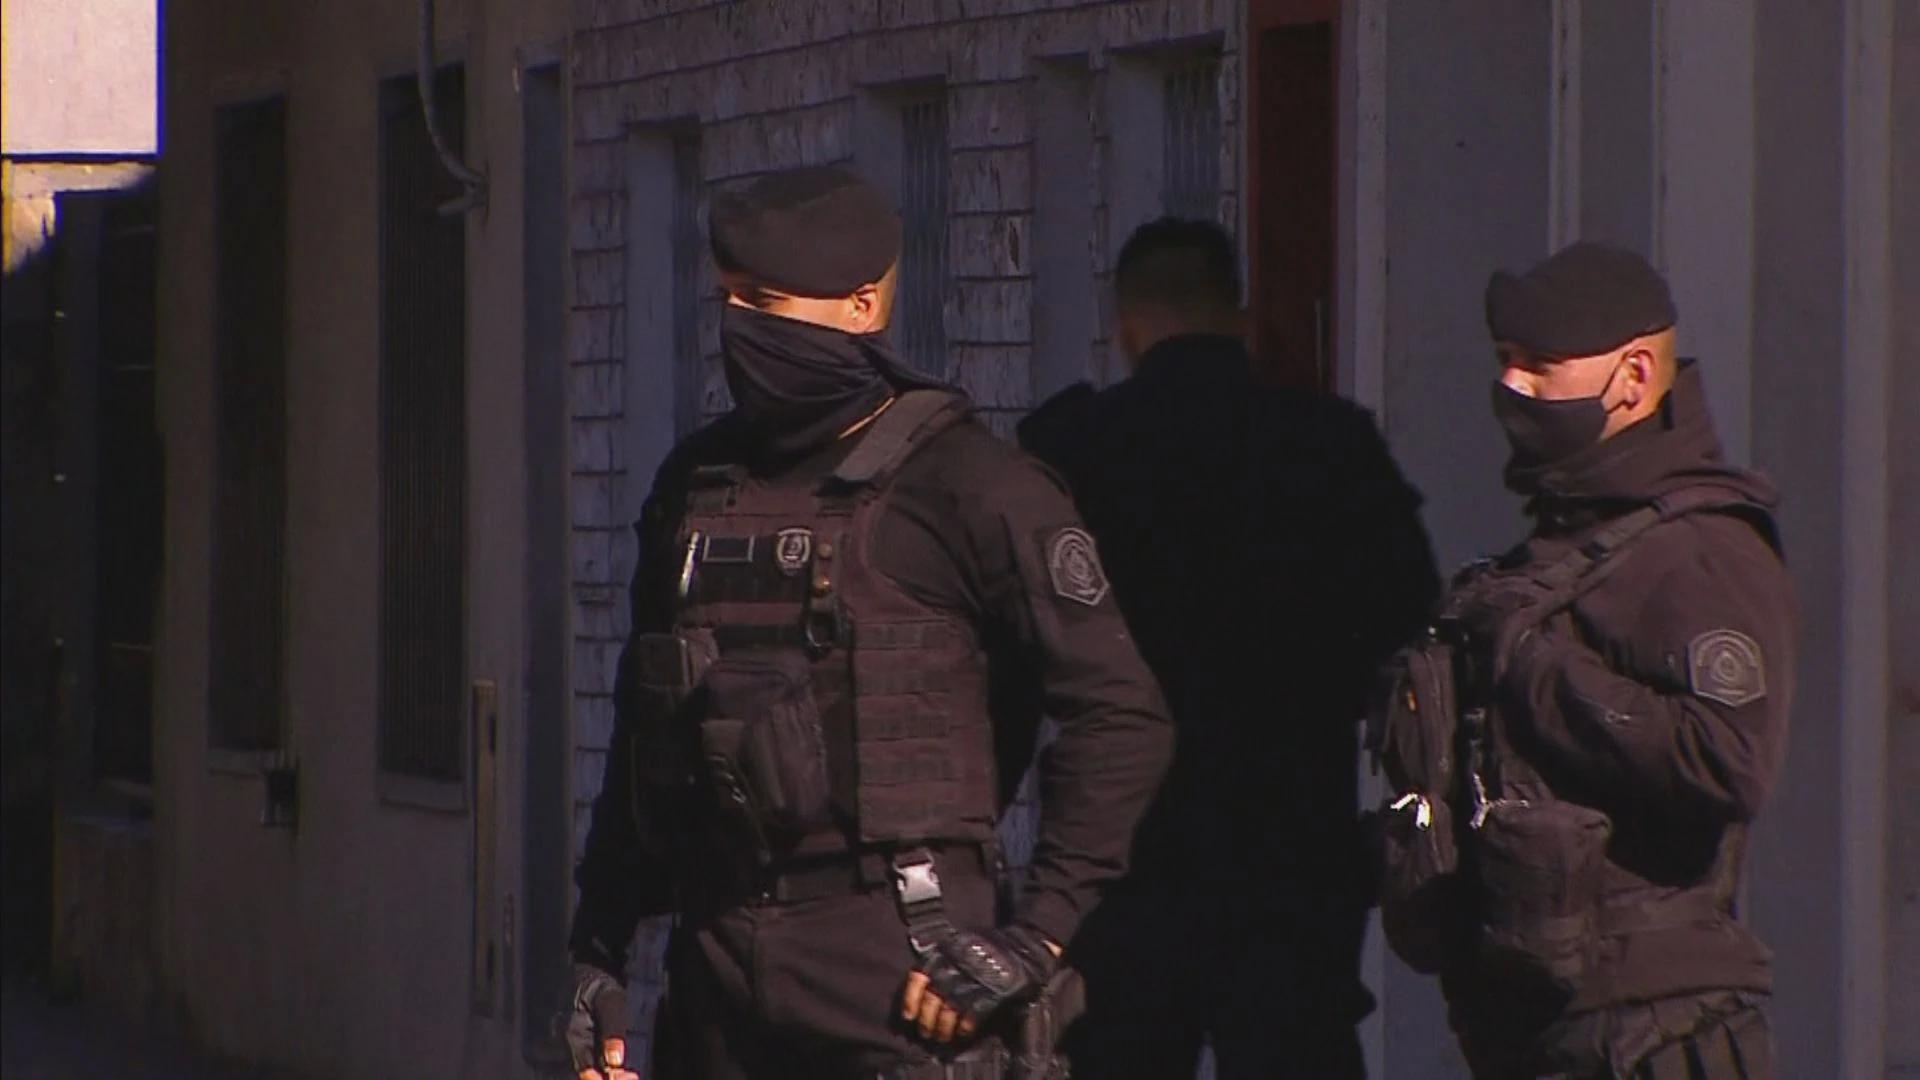 la matanza: un policia enfrento a 12 delincuentes en un robo